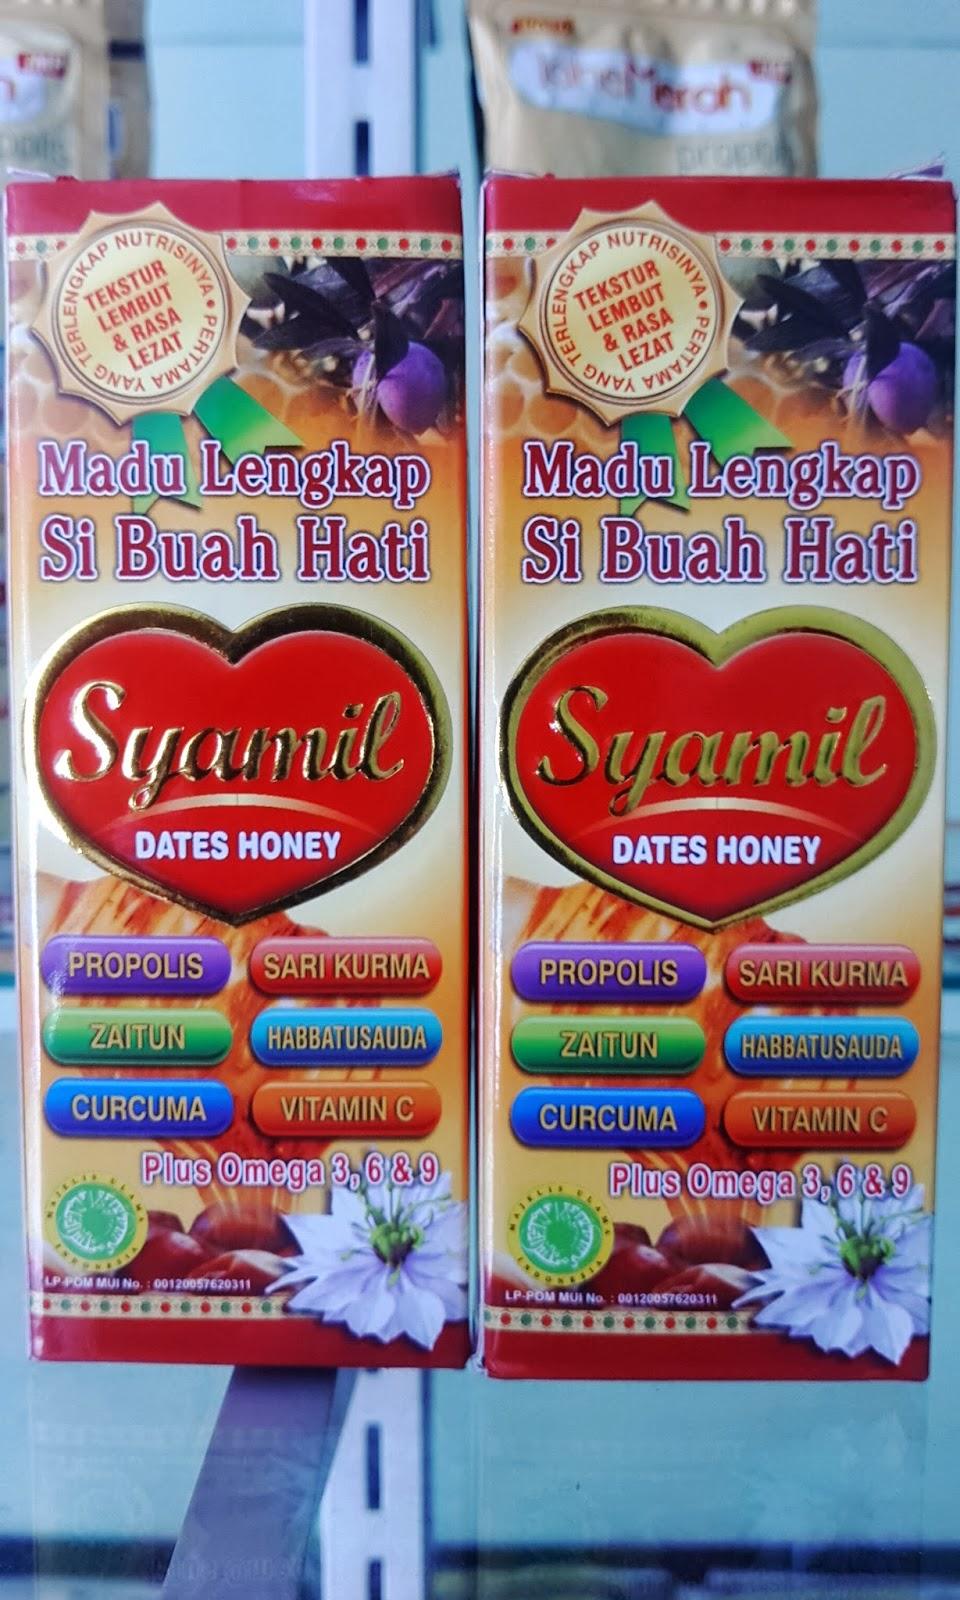 Kuwaysa Herbal Dan Buku Islam Toko Online Alami Madu Lengkap Si Buah Hati Syamil Dates Honey Merupakan Yang Mengandung Komposisi